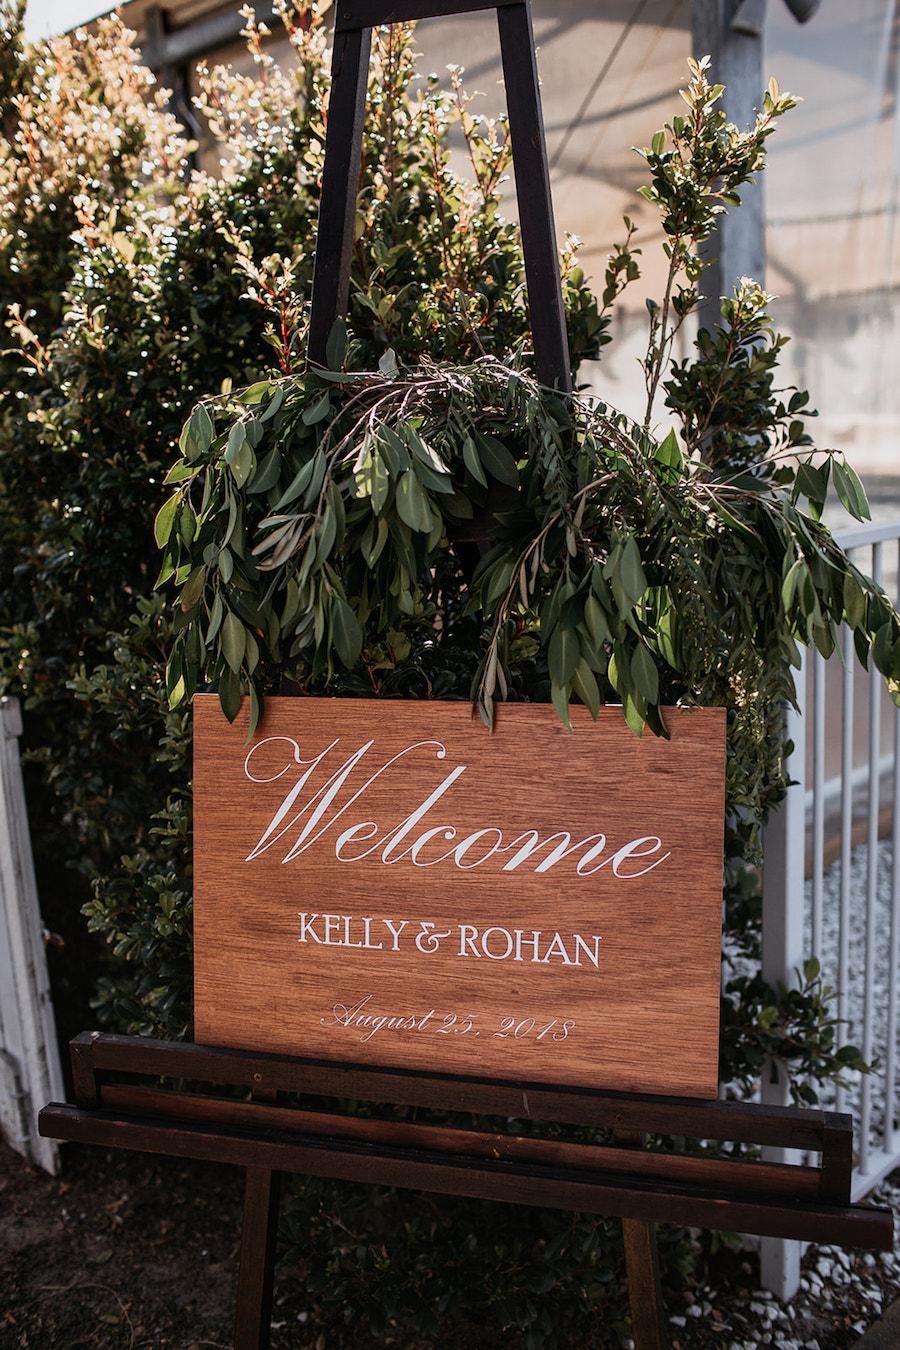 tweed-coast-weddings-wedding-venue-osteria-kelly-rohan-cloud-catcher-photography-Web_RK175.jpg